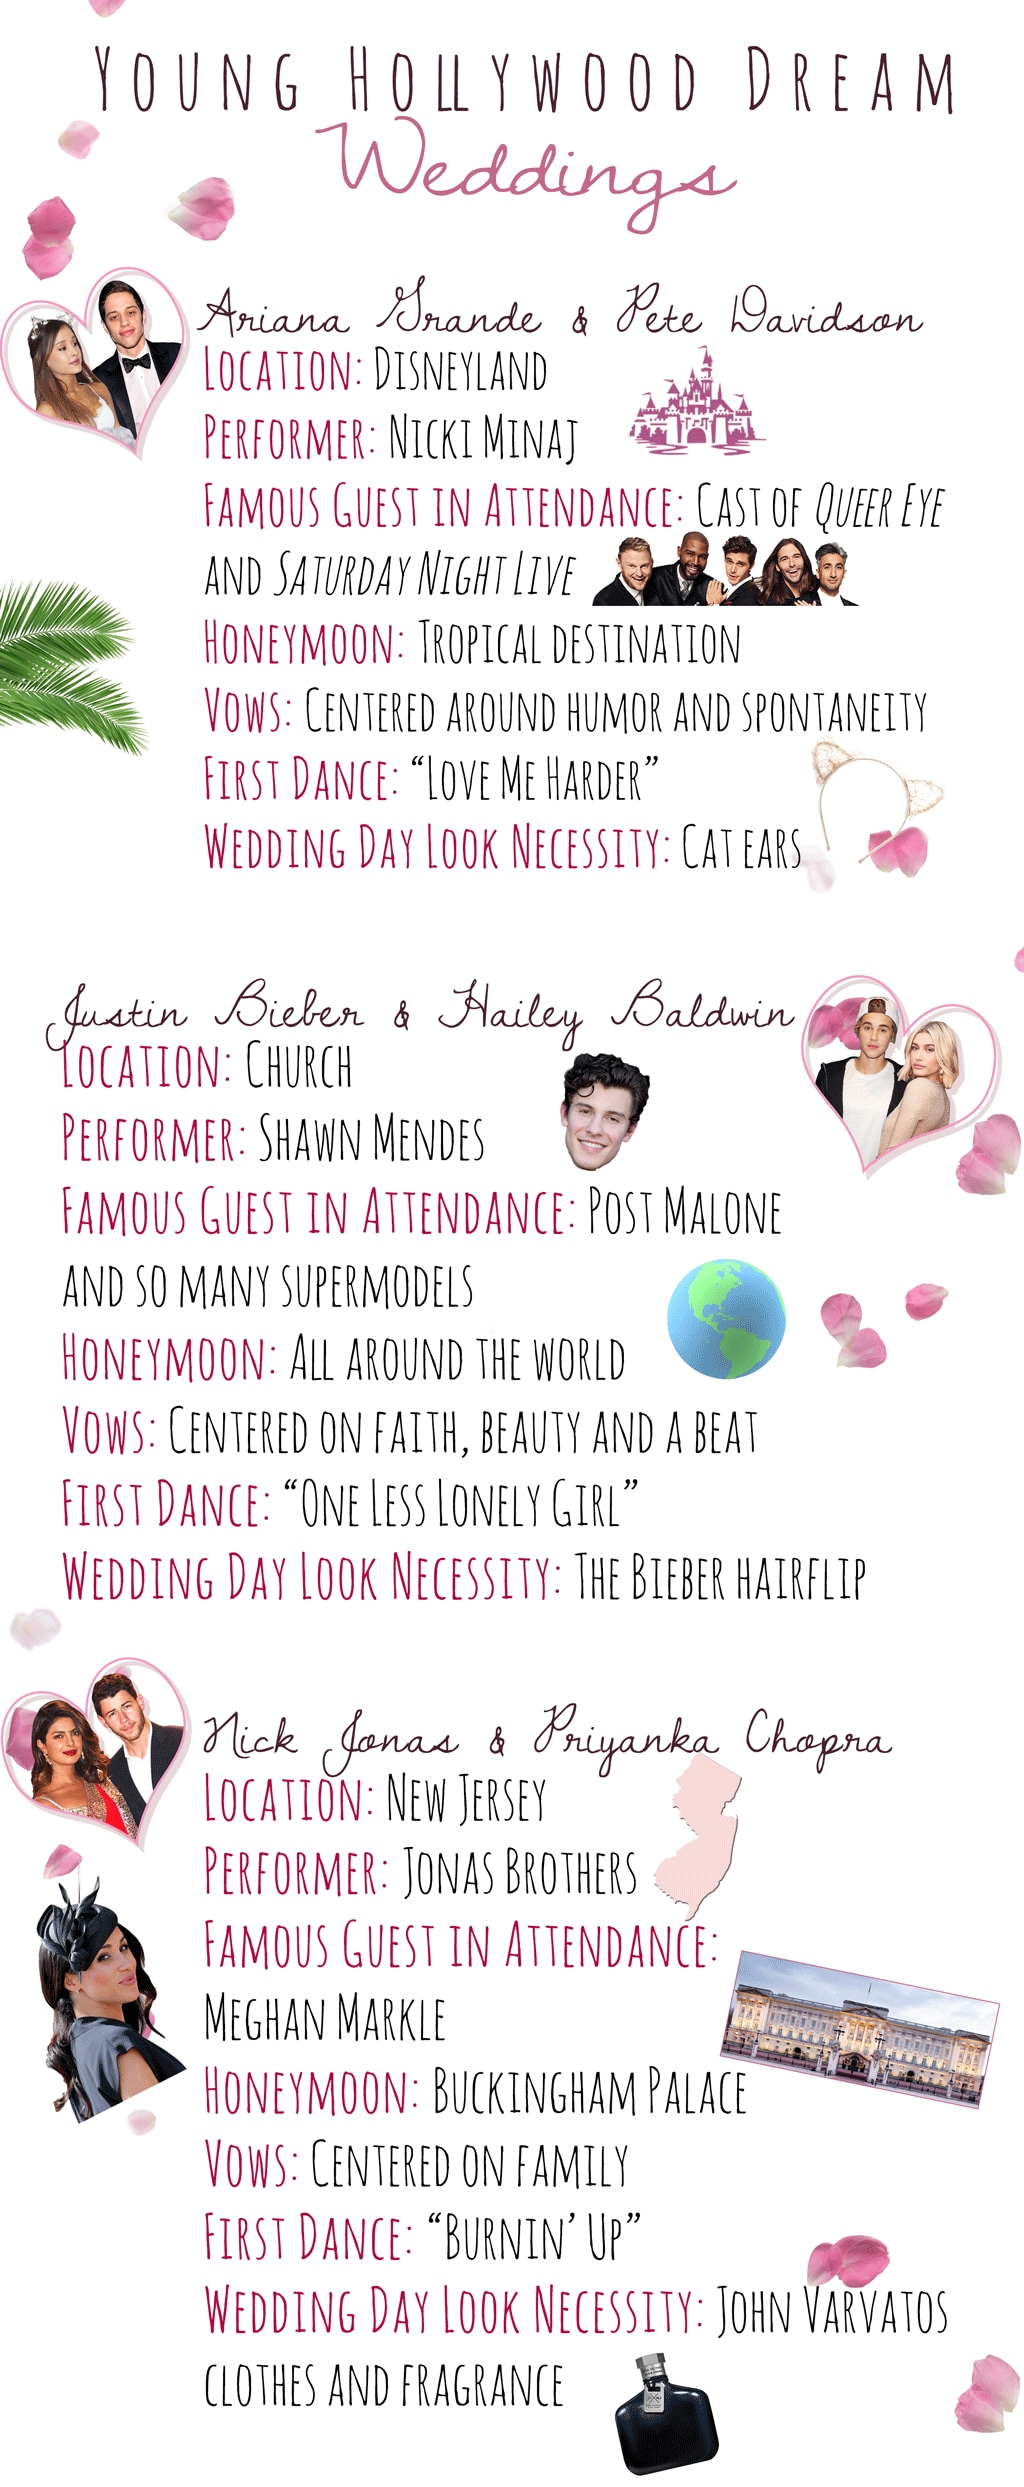 Young Hollywood Dream Weddings, Ariana Grande, Pete Davidson, Justin Bieber, Hailey Baldwin, Nick Jonas, Priyanka Chopra